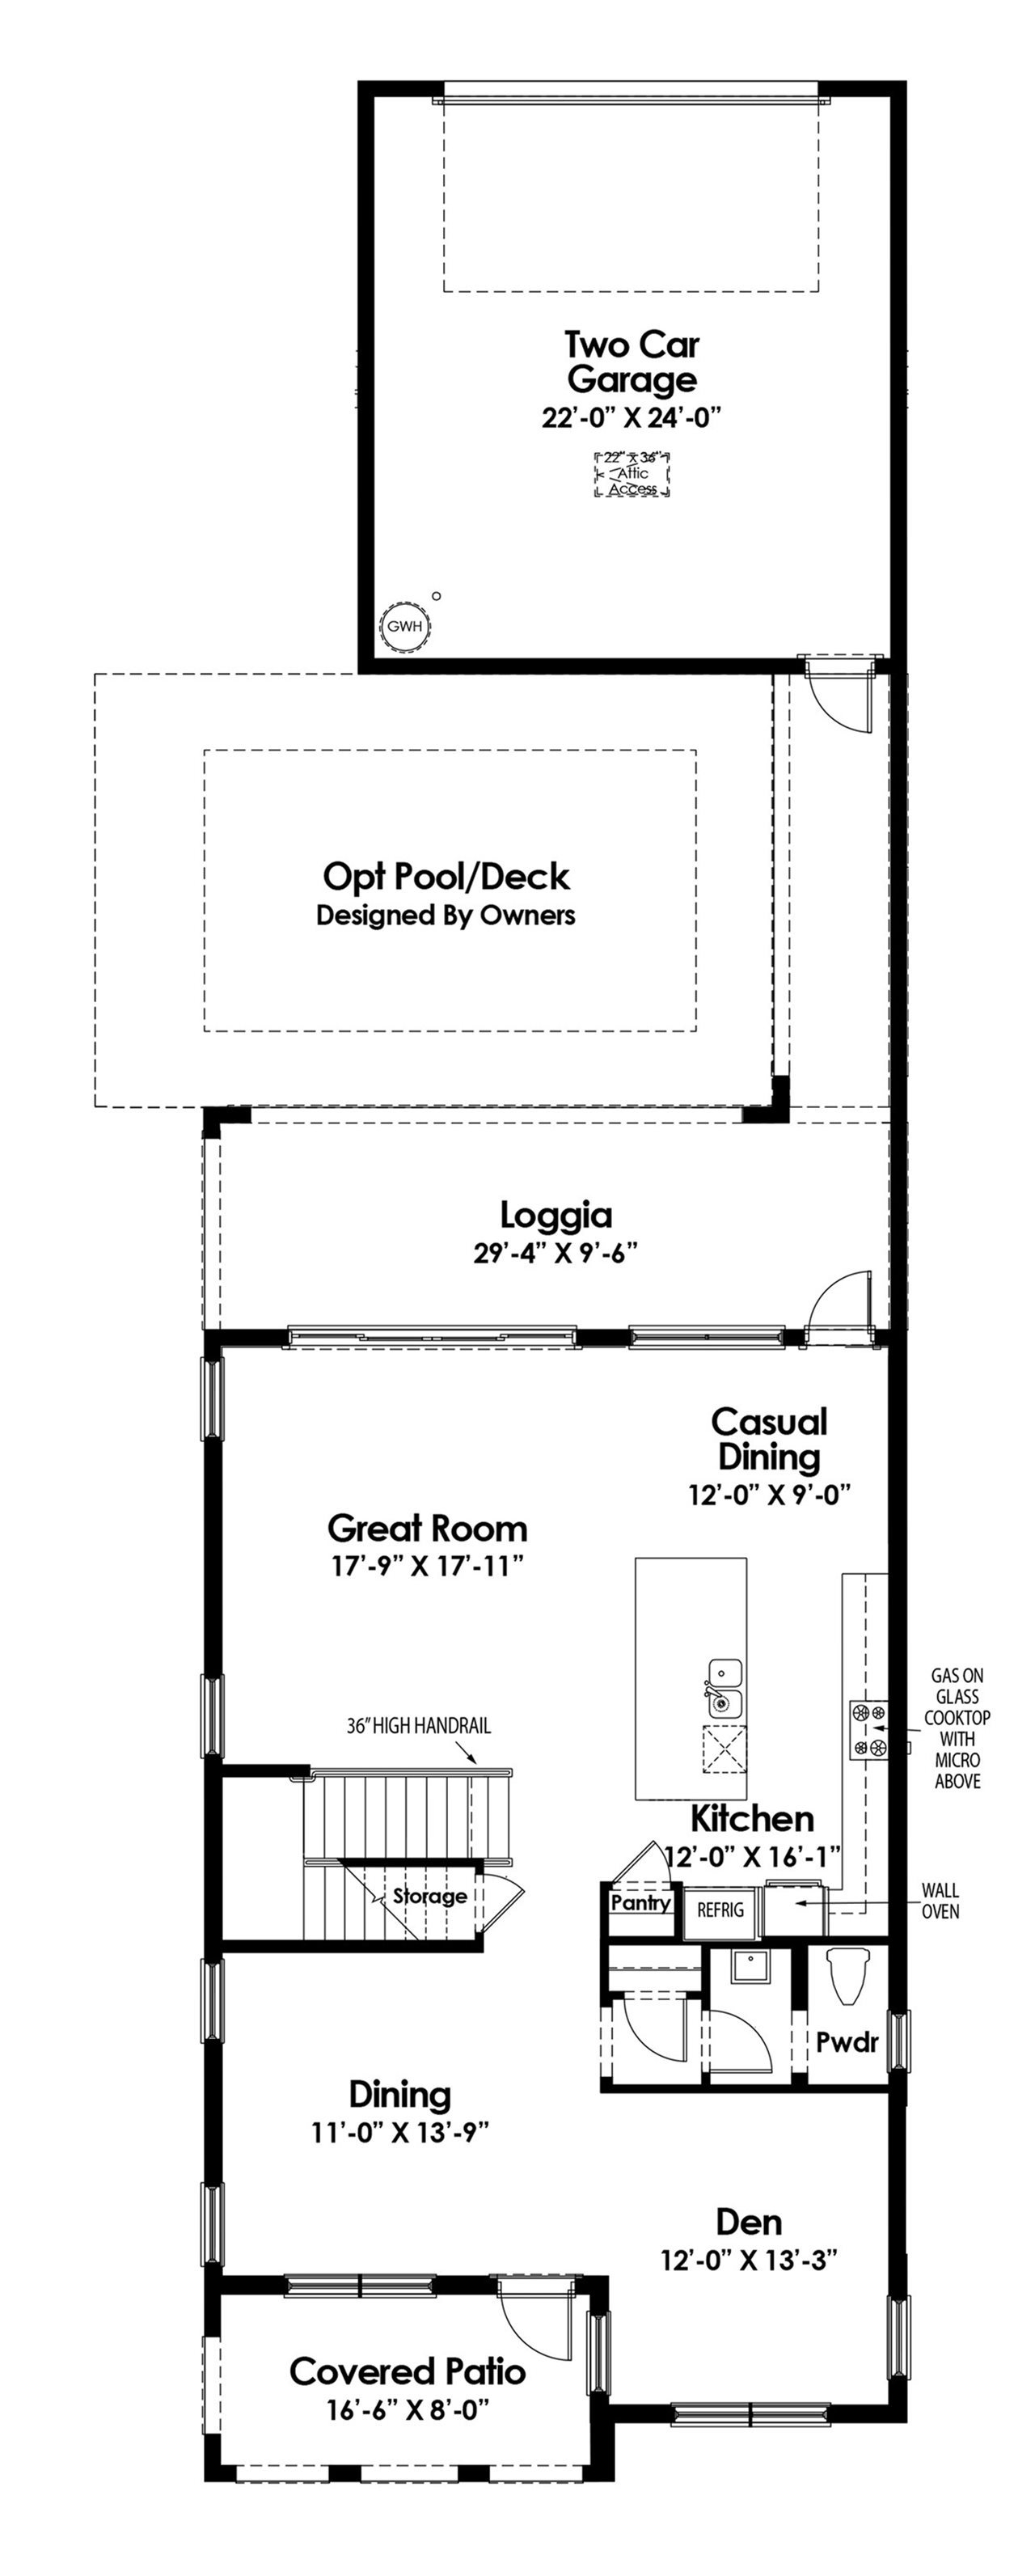 45347698 200807 - Alton Palm Beach Gardens Floor Plans